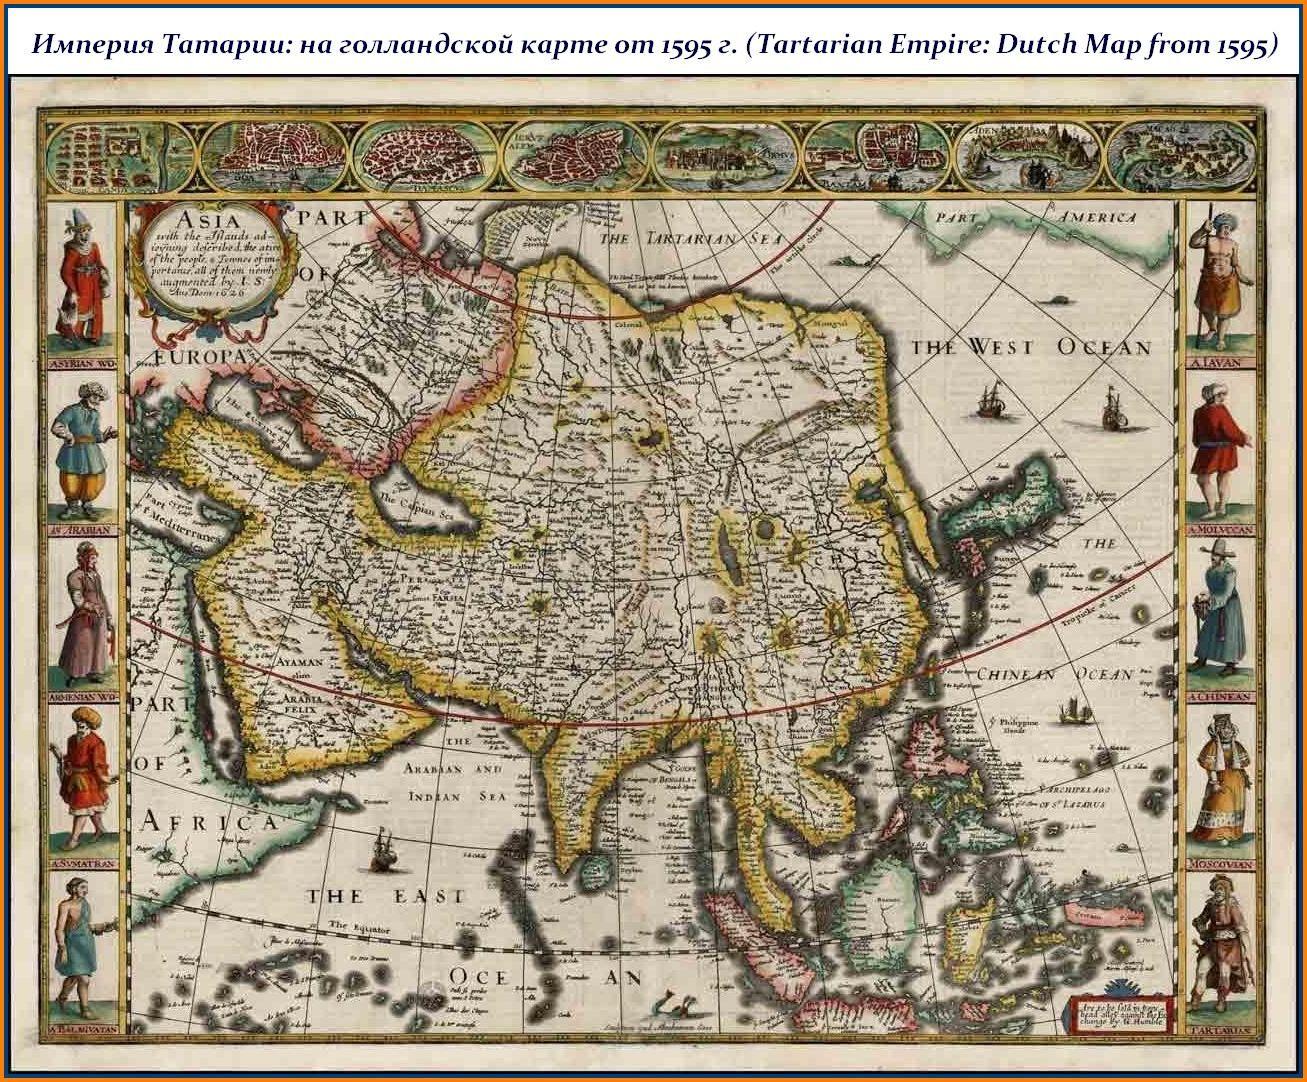 Империя Татарии: на голландской карте от 1595 г. (Tartarian Empire: Dutch  Map from 1595)